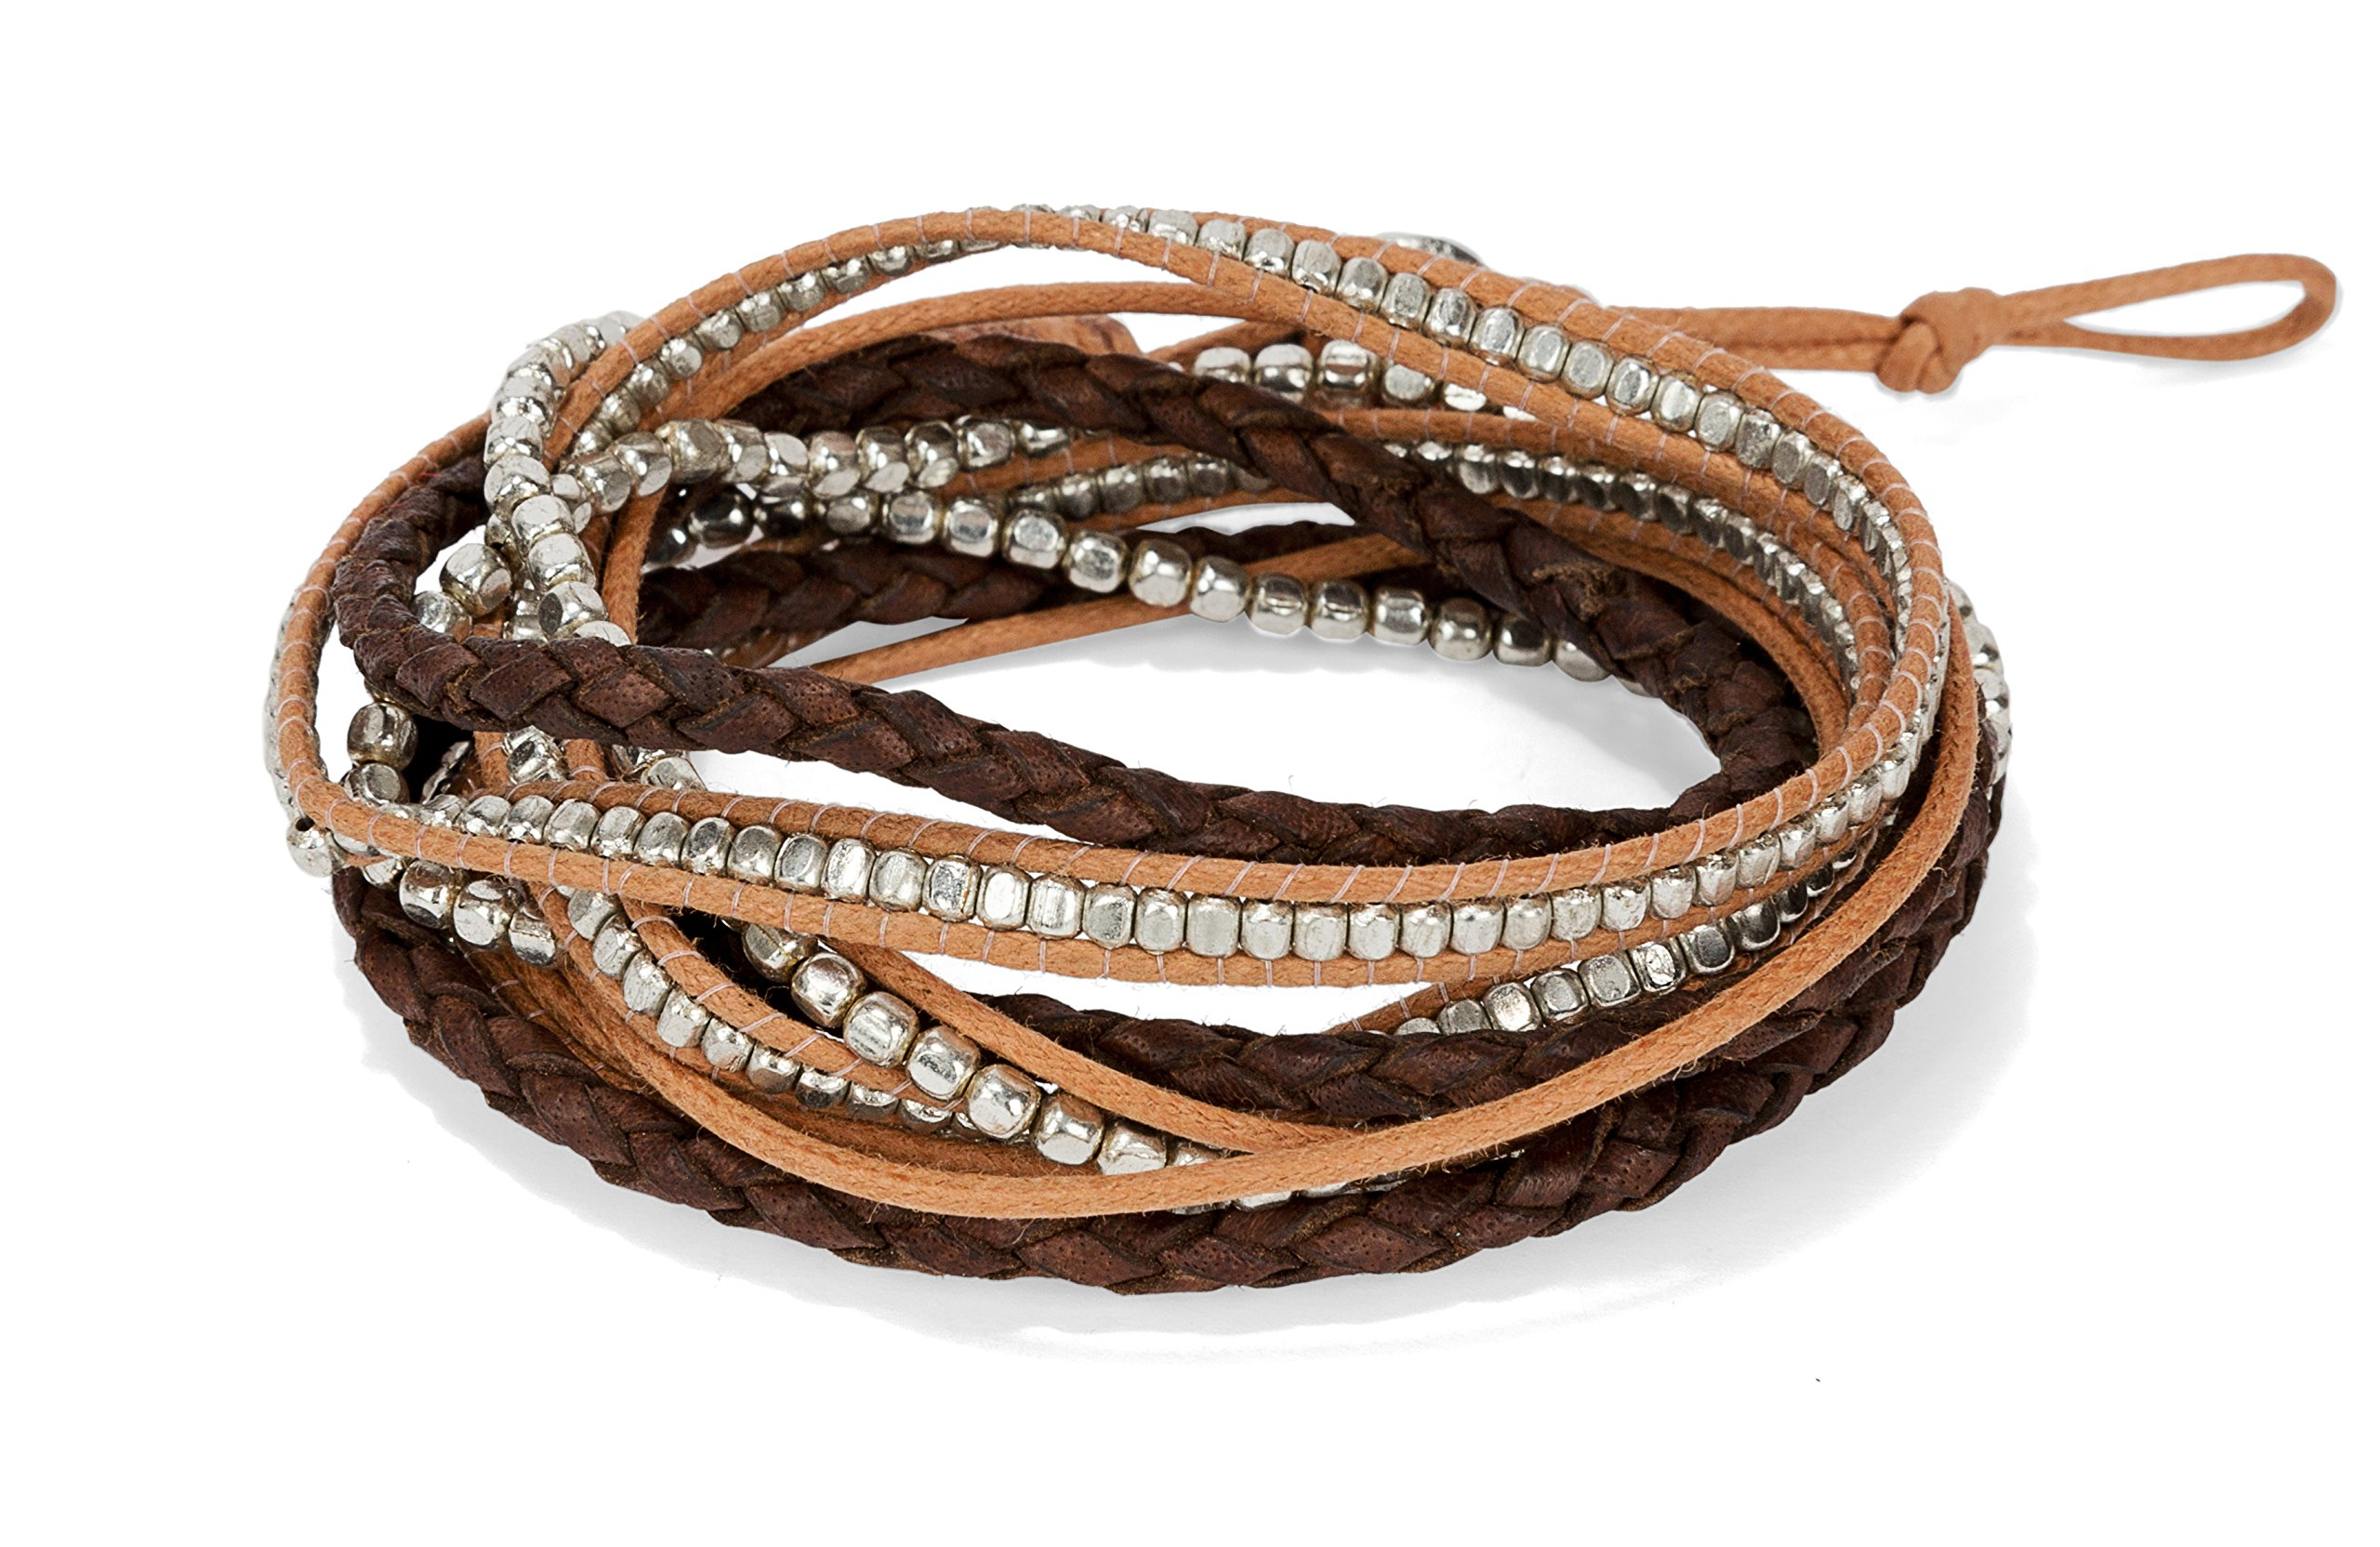 SPUNKYsoul Handmade Boho 3 Wrap Multi Strand Bracelet Camel, Brown and Silver for Women Collection